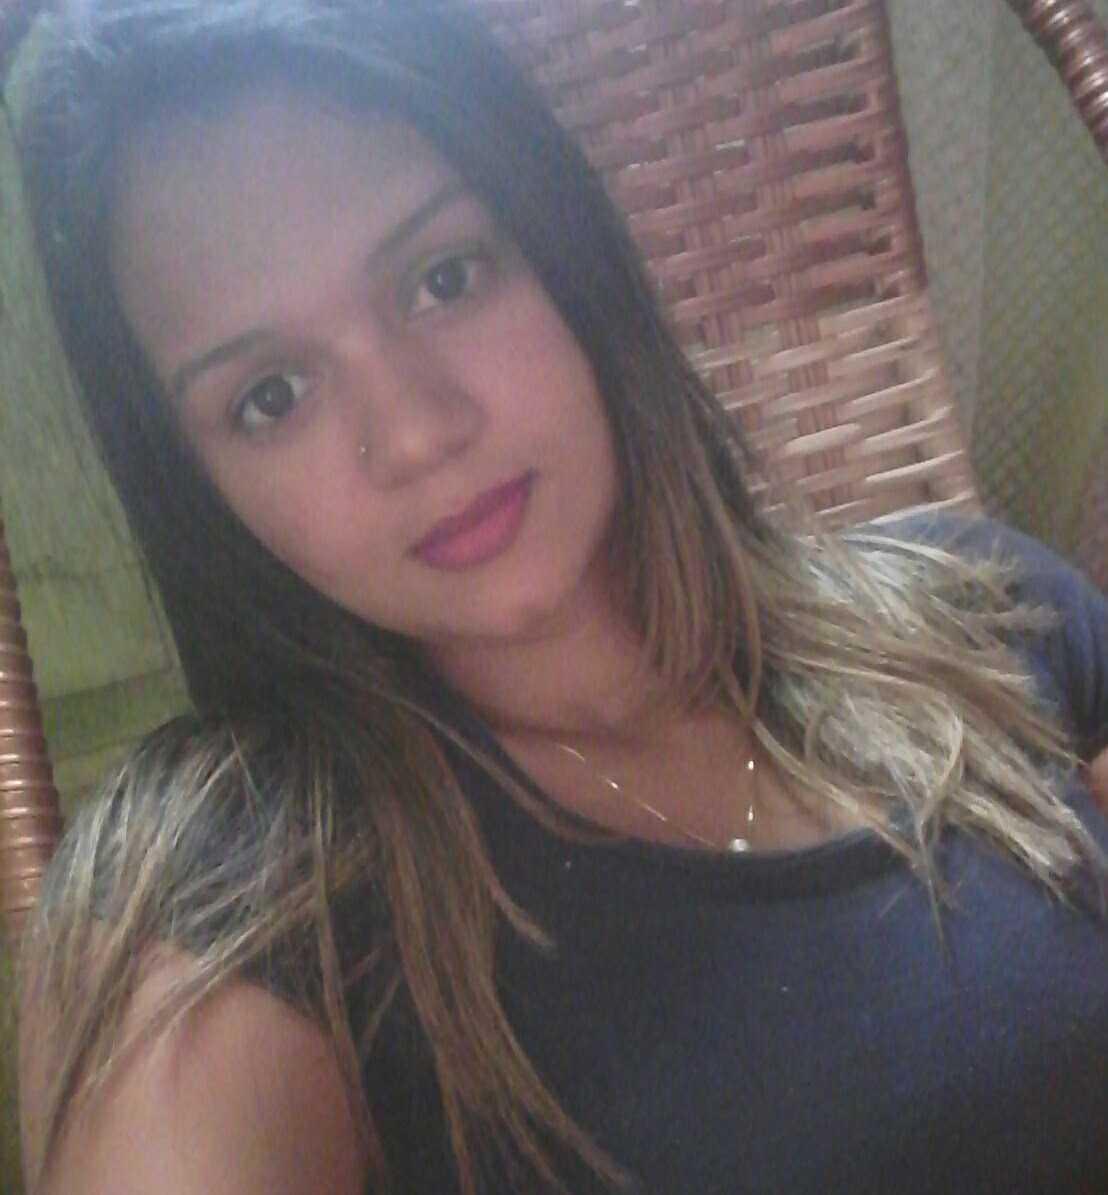 Kerolayne Brito dos Santos